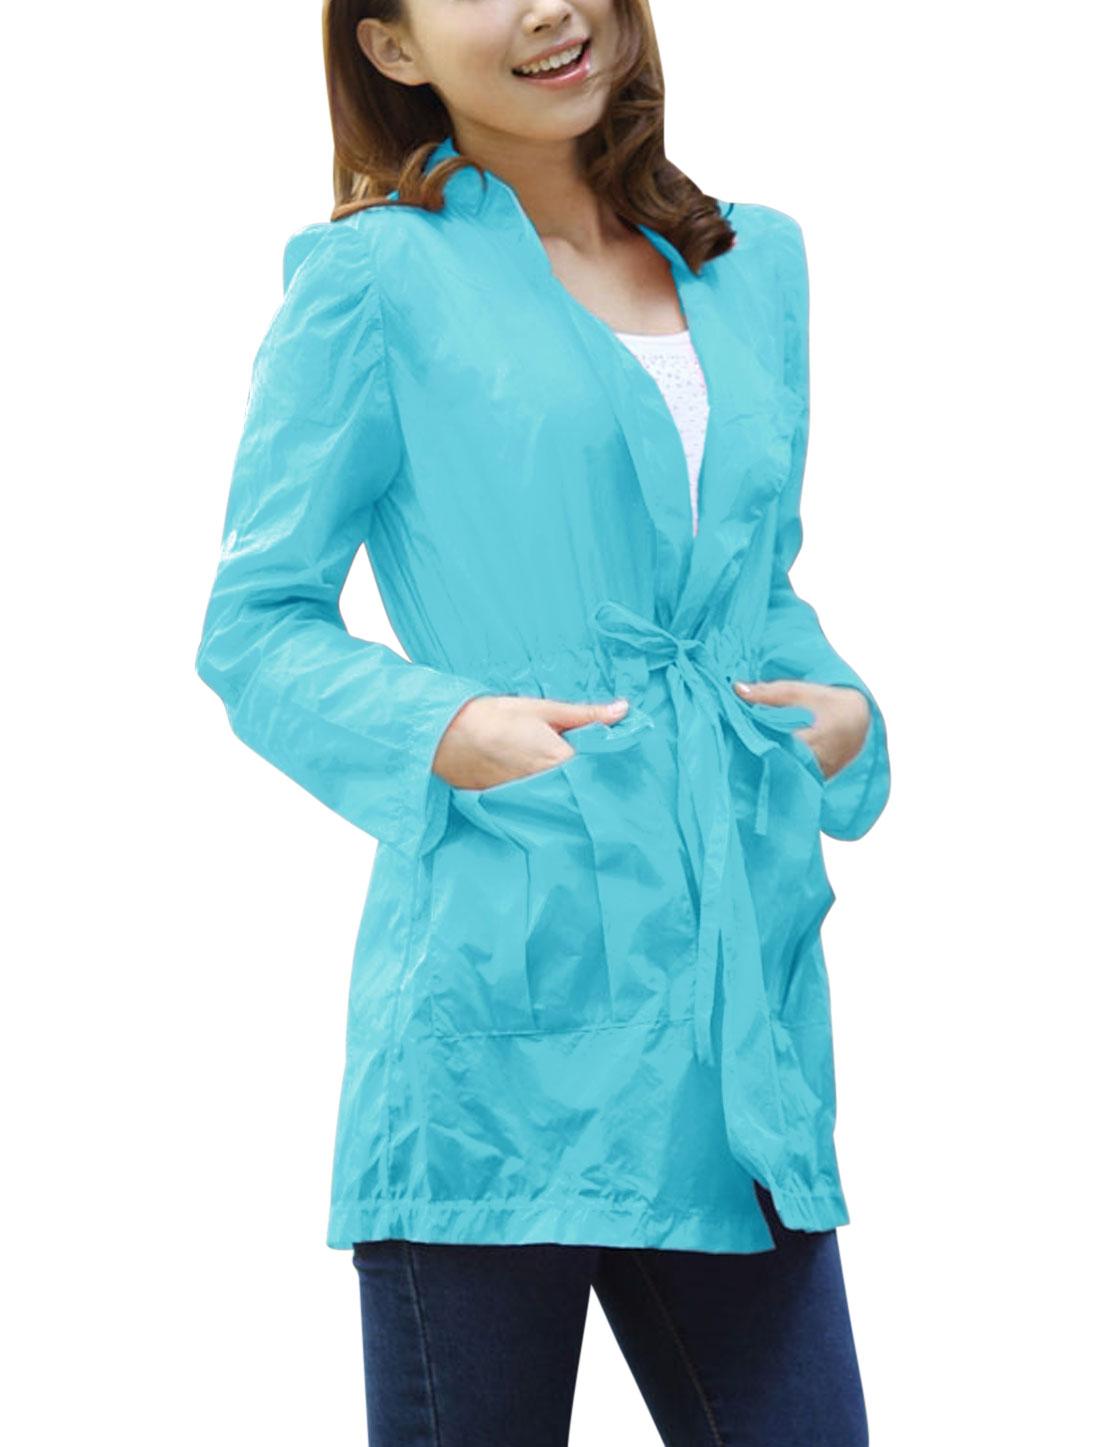 Lady Two Pockets Long Sleeve Drawstring Waist Thin Jacket Sky Blue XS